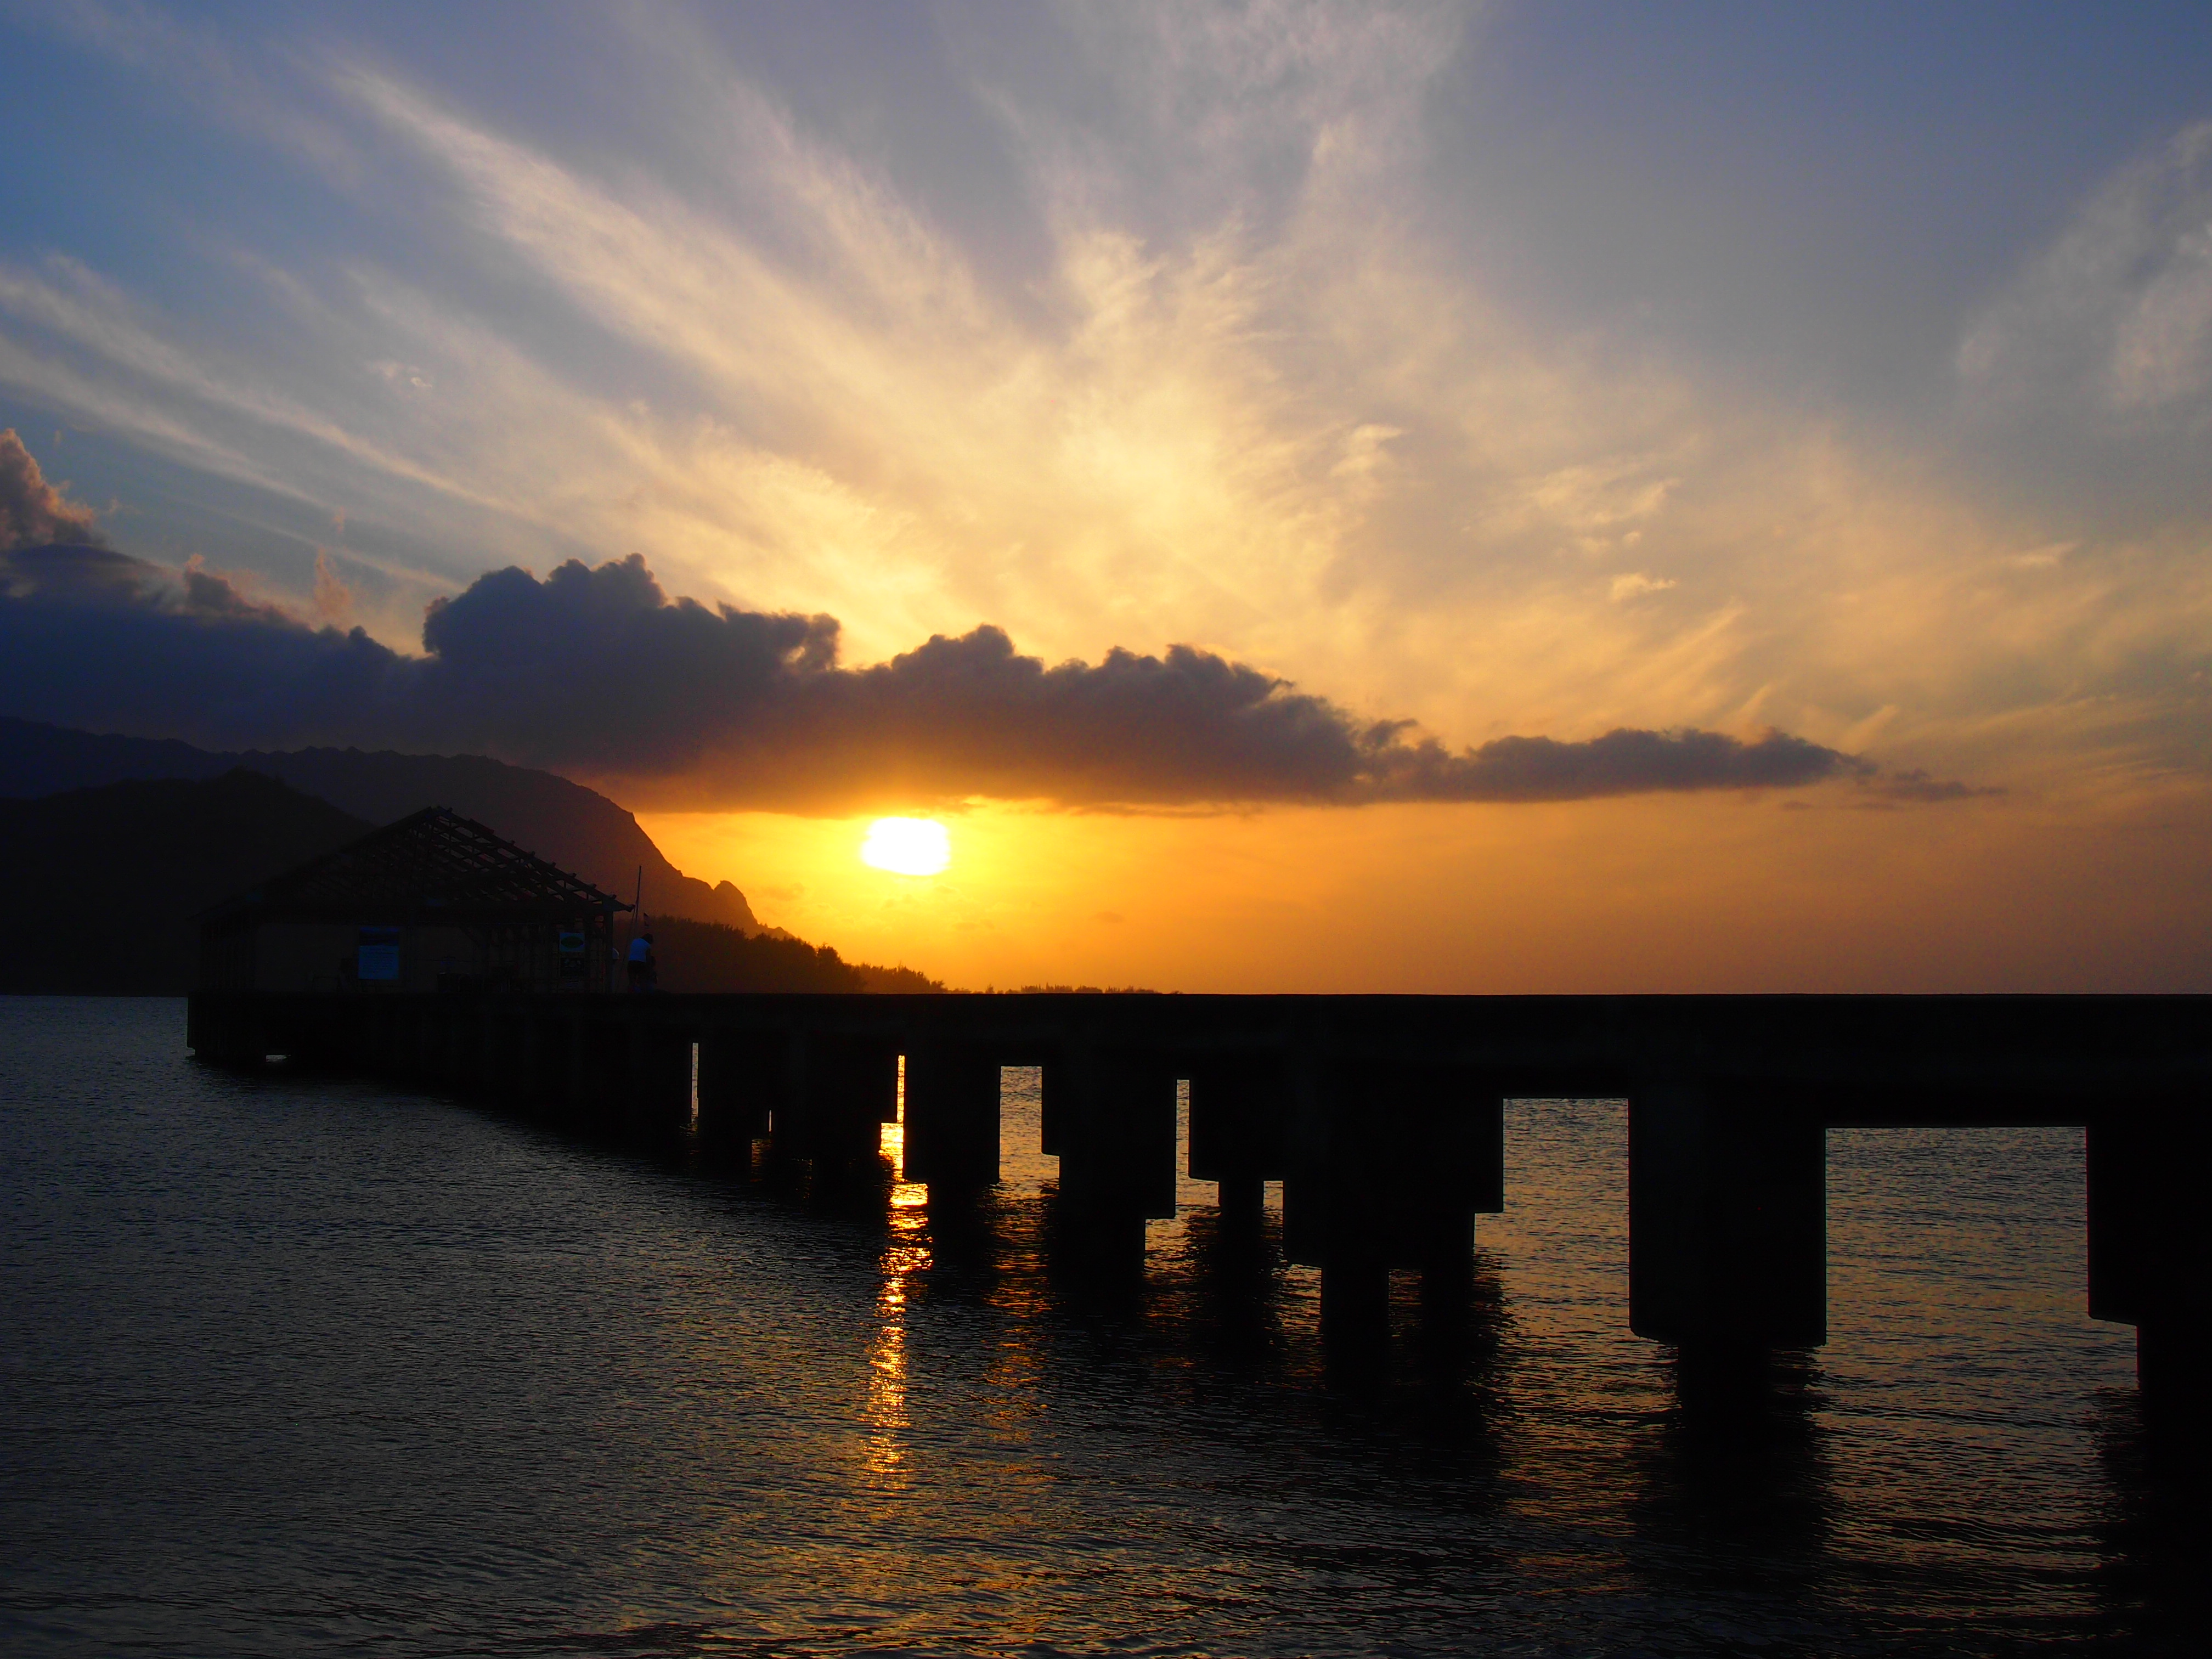 Sunset in kauai hawaii photo